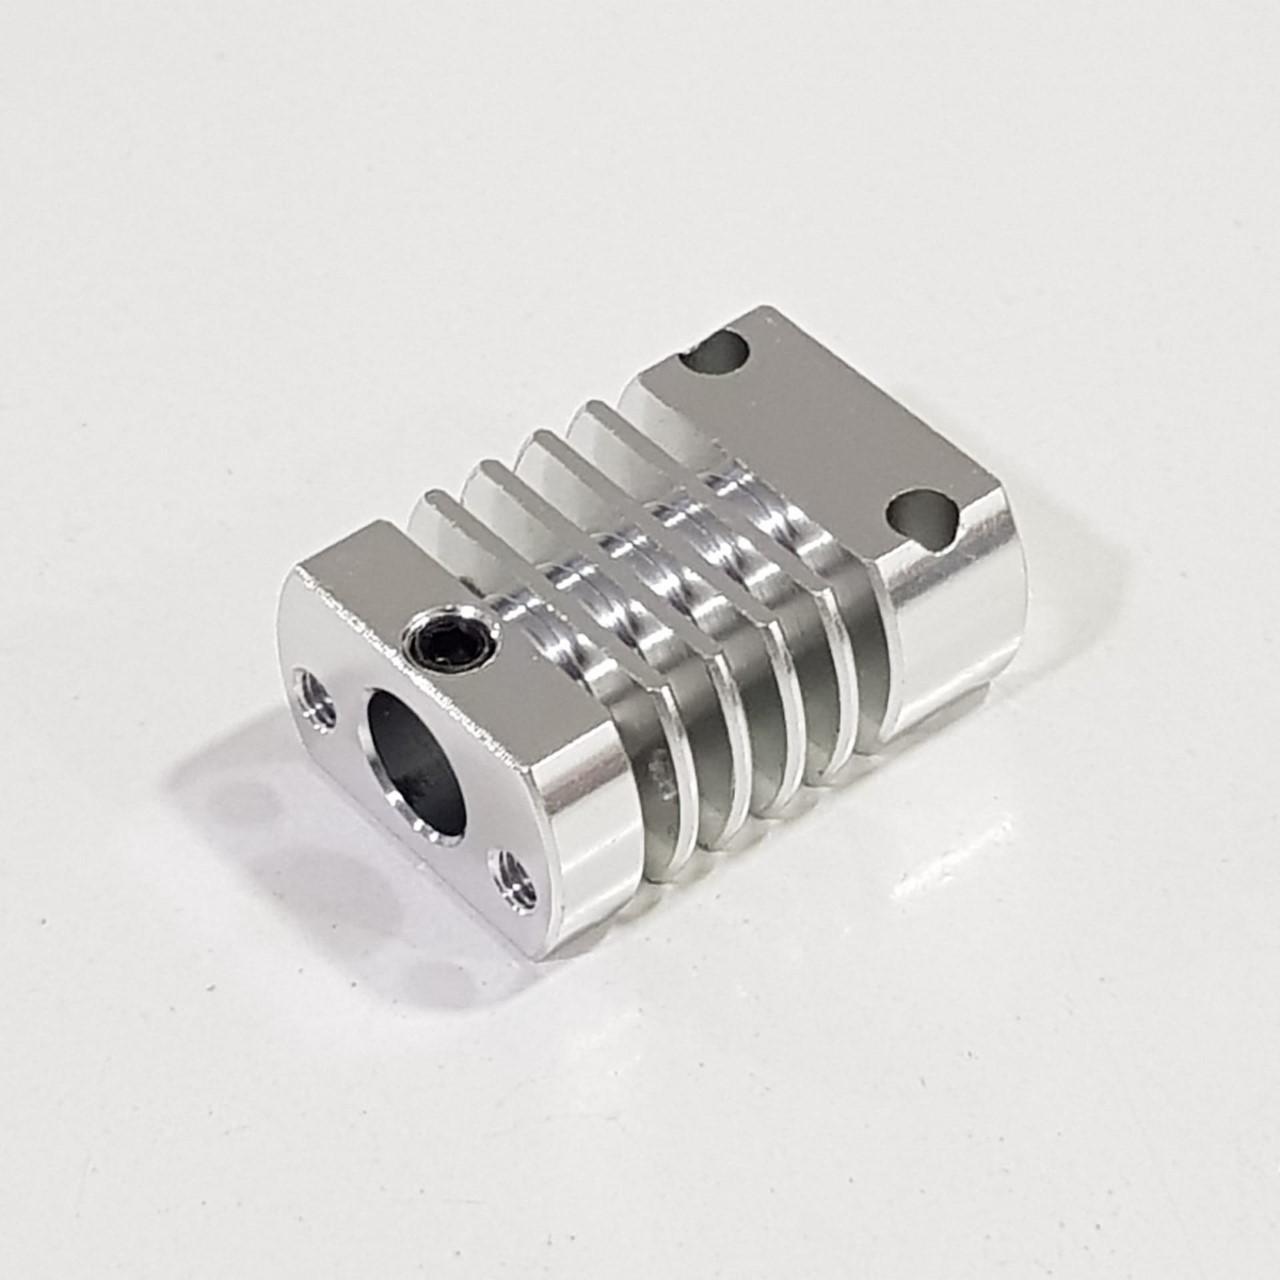 Heatsink MK10 (Cr10, Ender)